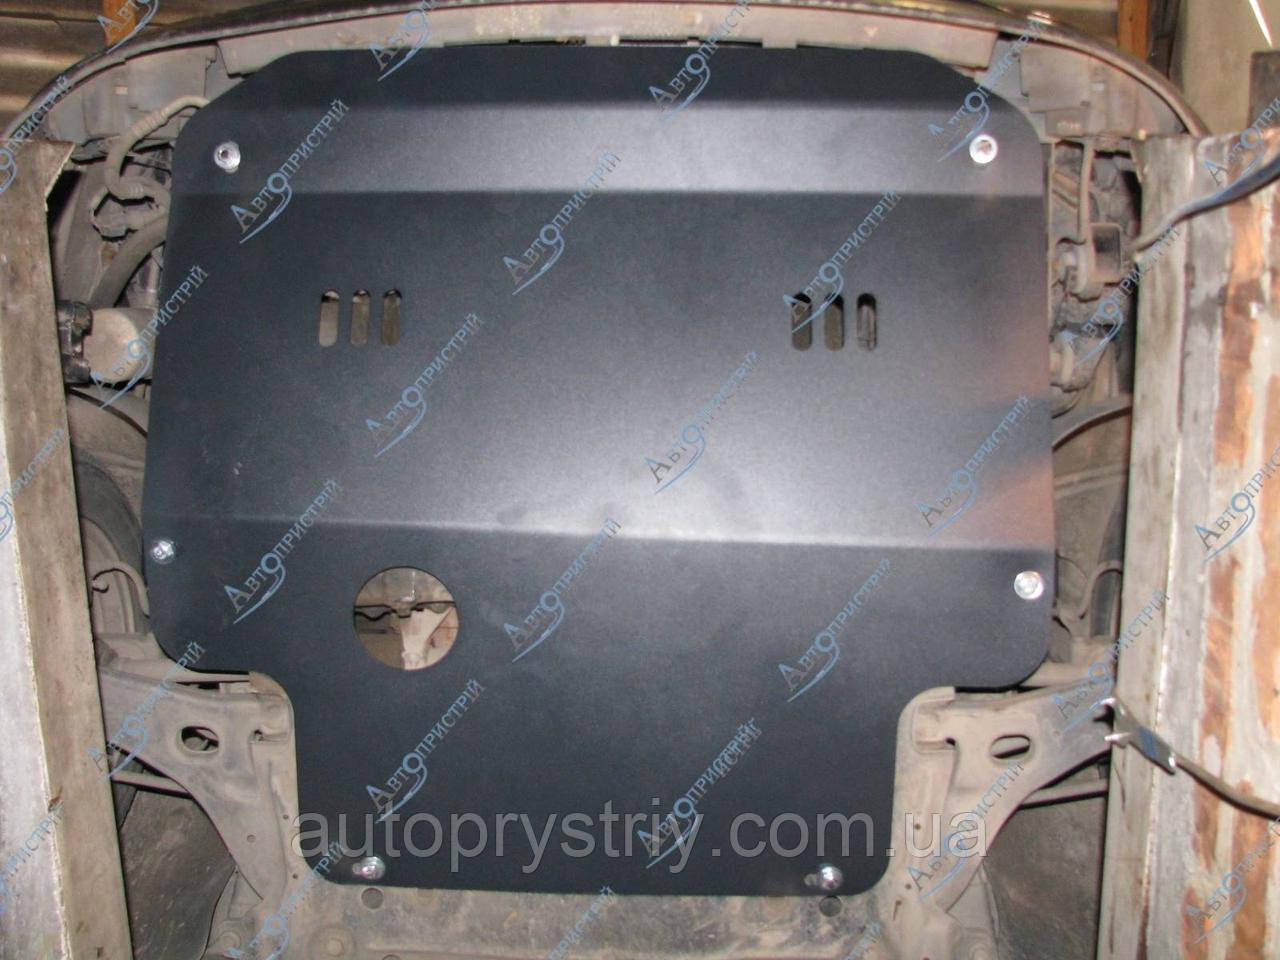 Захист двигуна і КПП Citroen Jumper (1995-2006) всі, крім 2.5 D